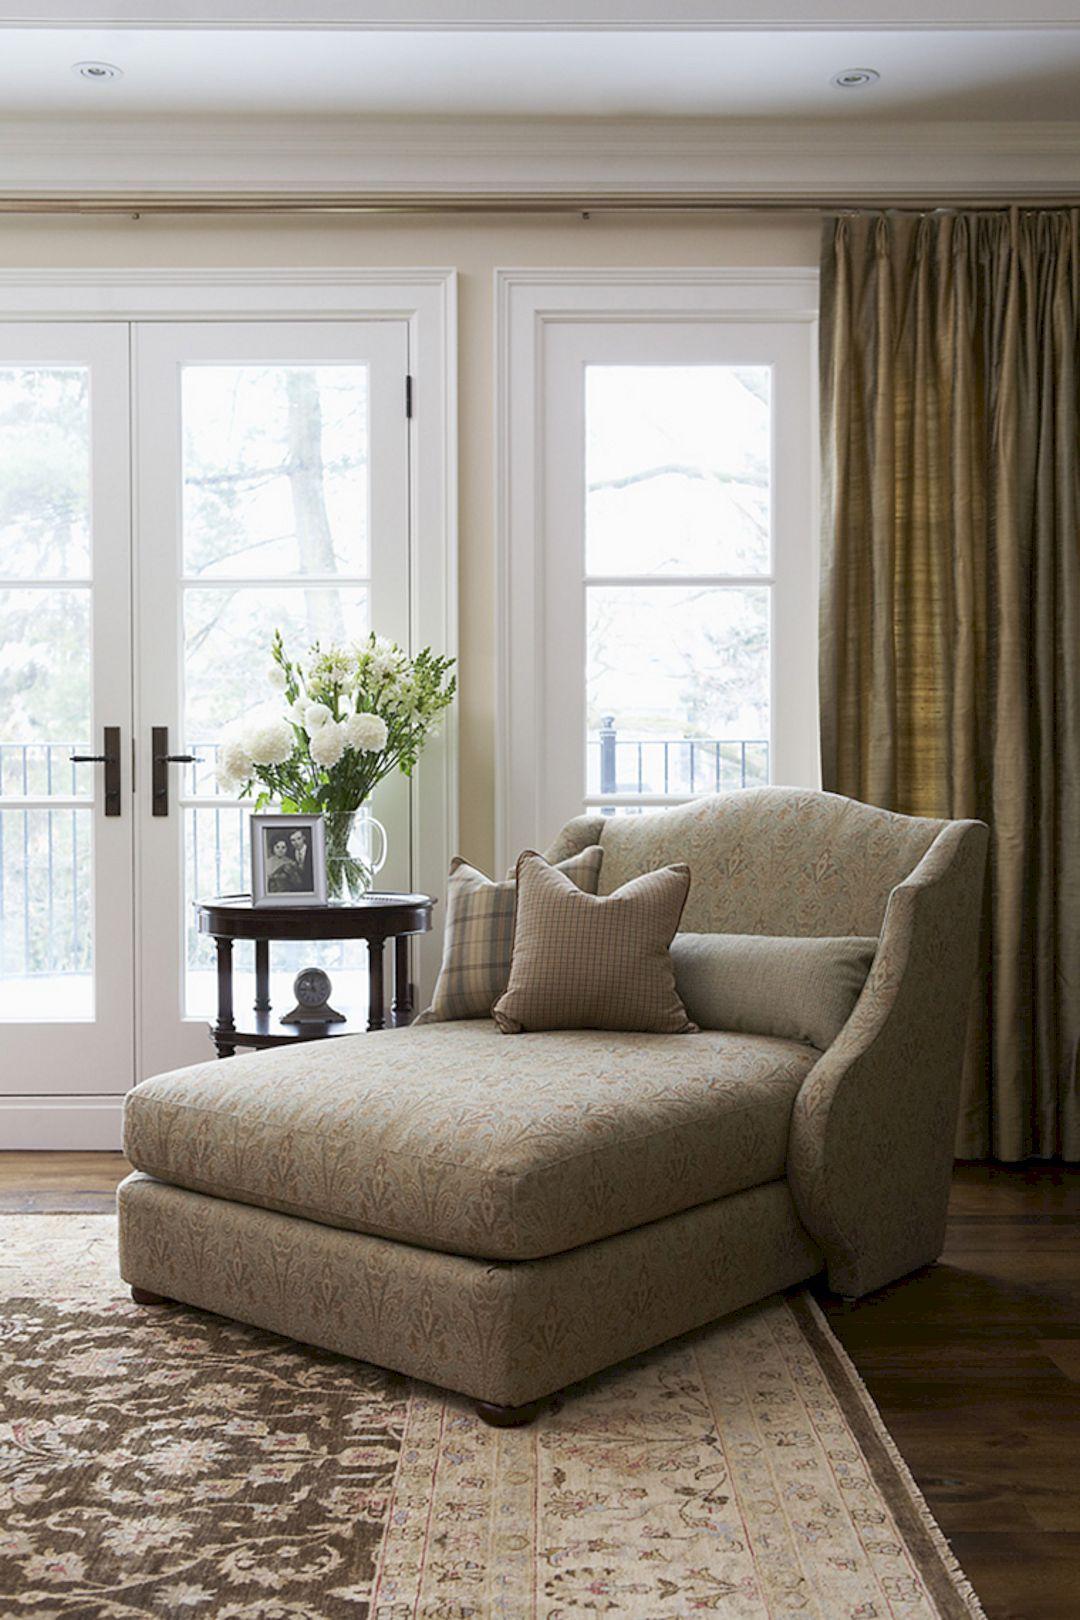 11 Stunning Master Bedroom Decorating Ideas Apartment Li